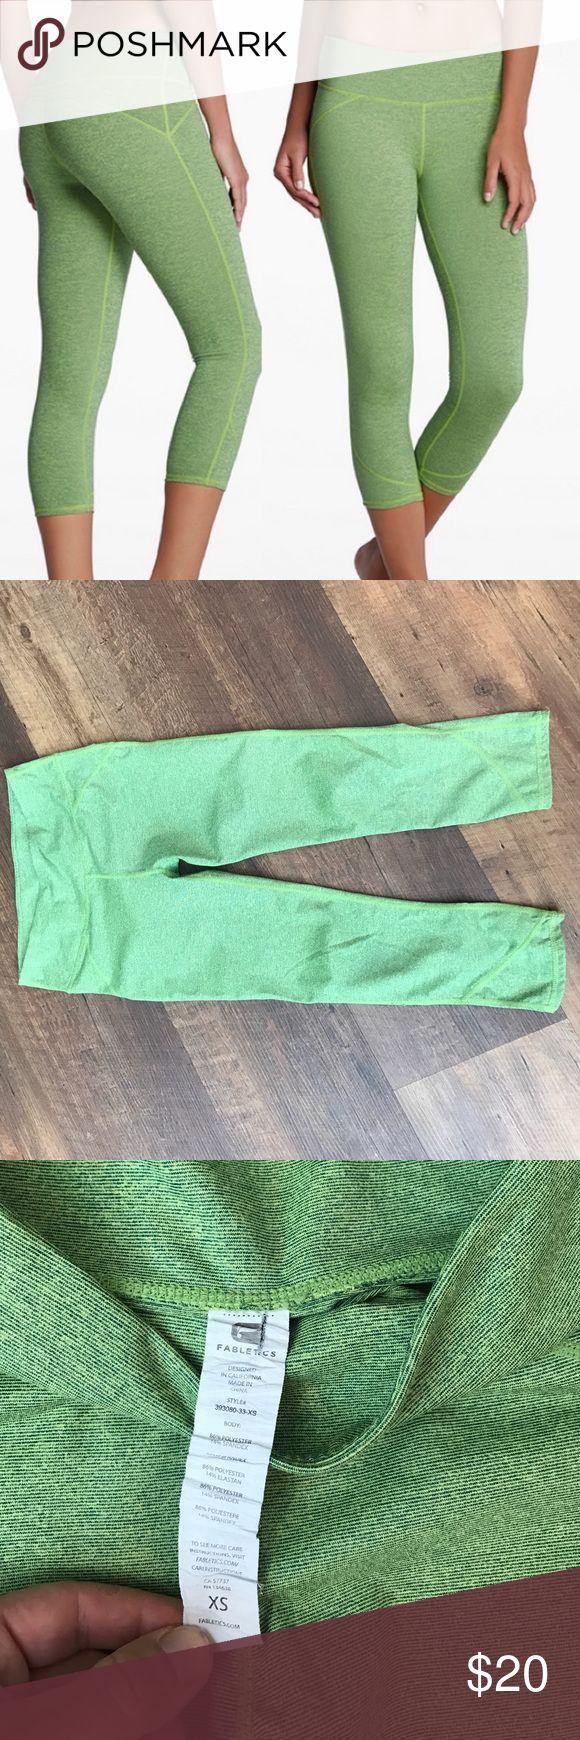 Fabletics Lima Capri, like new! Excellent condition, super comfy fit. Lime green in color Fabletics Pants Capris